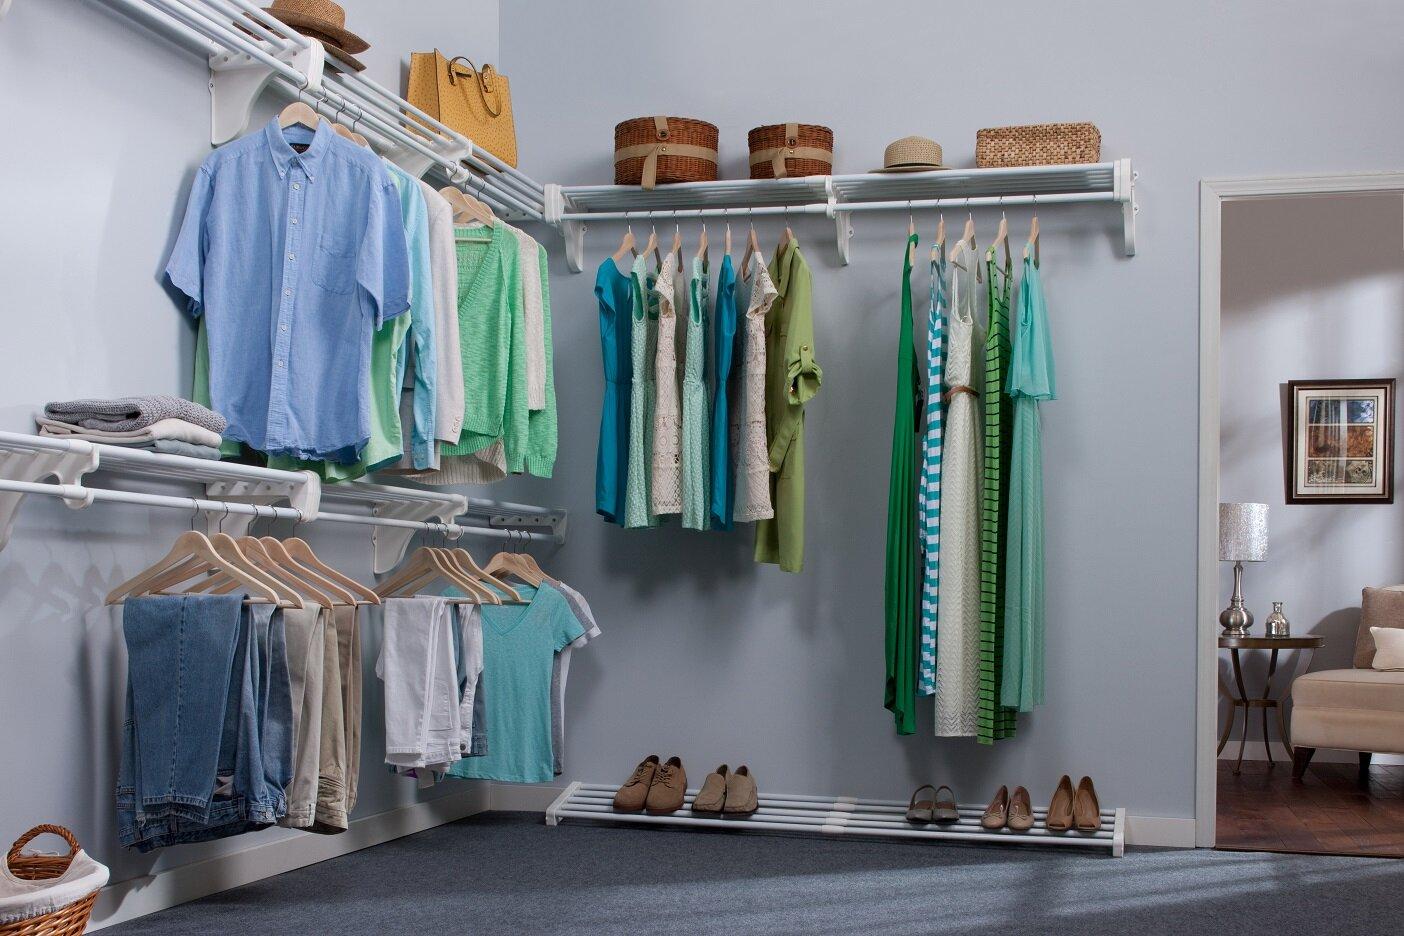 expandable walk in closet organizer 5 closet shelves rods and 4 end brackets ebay. Black Bedroom Furniture Sets. Home Design Ideas